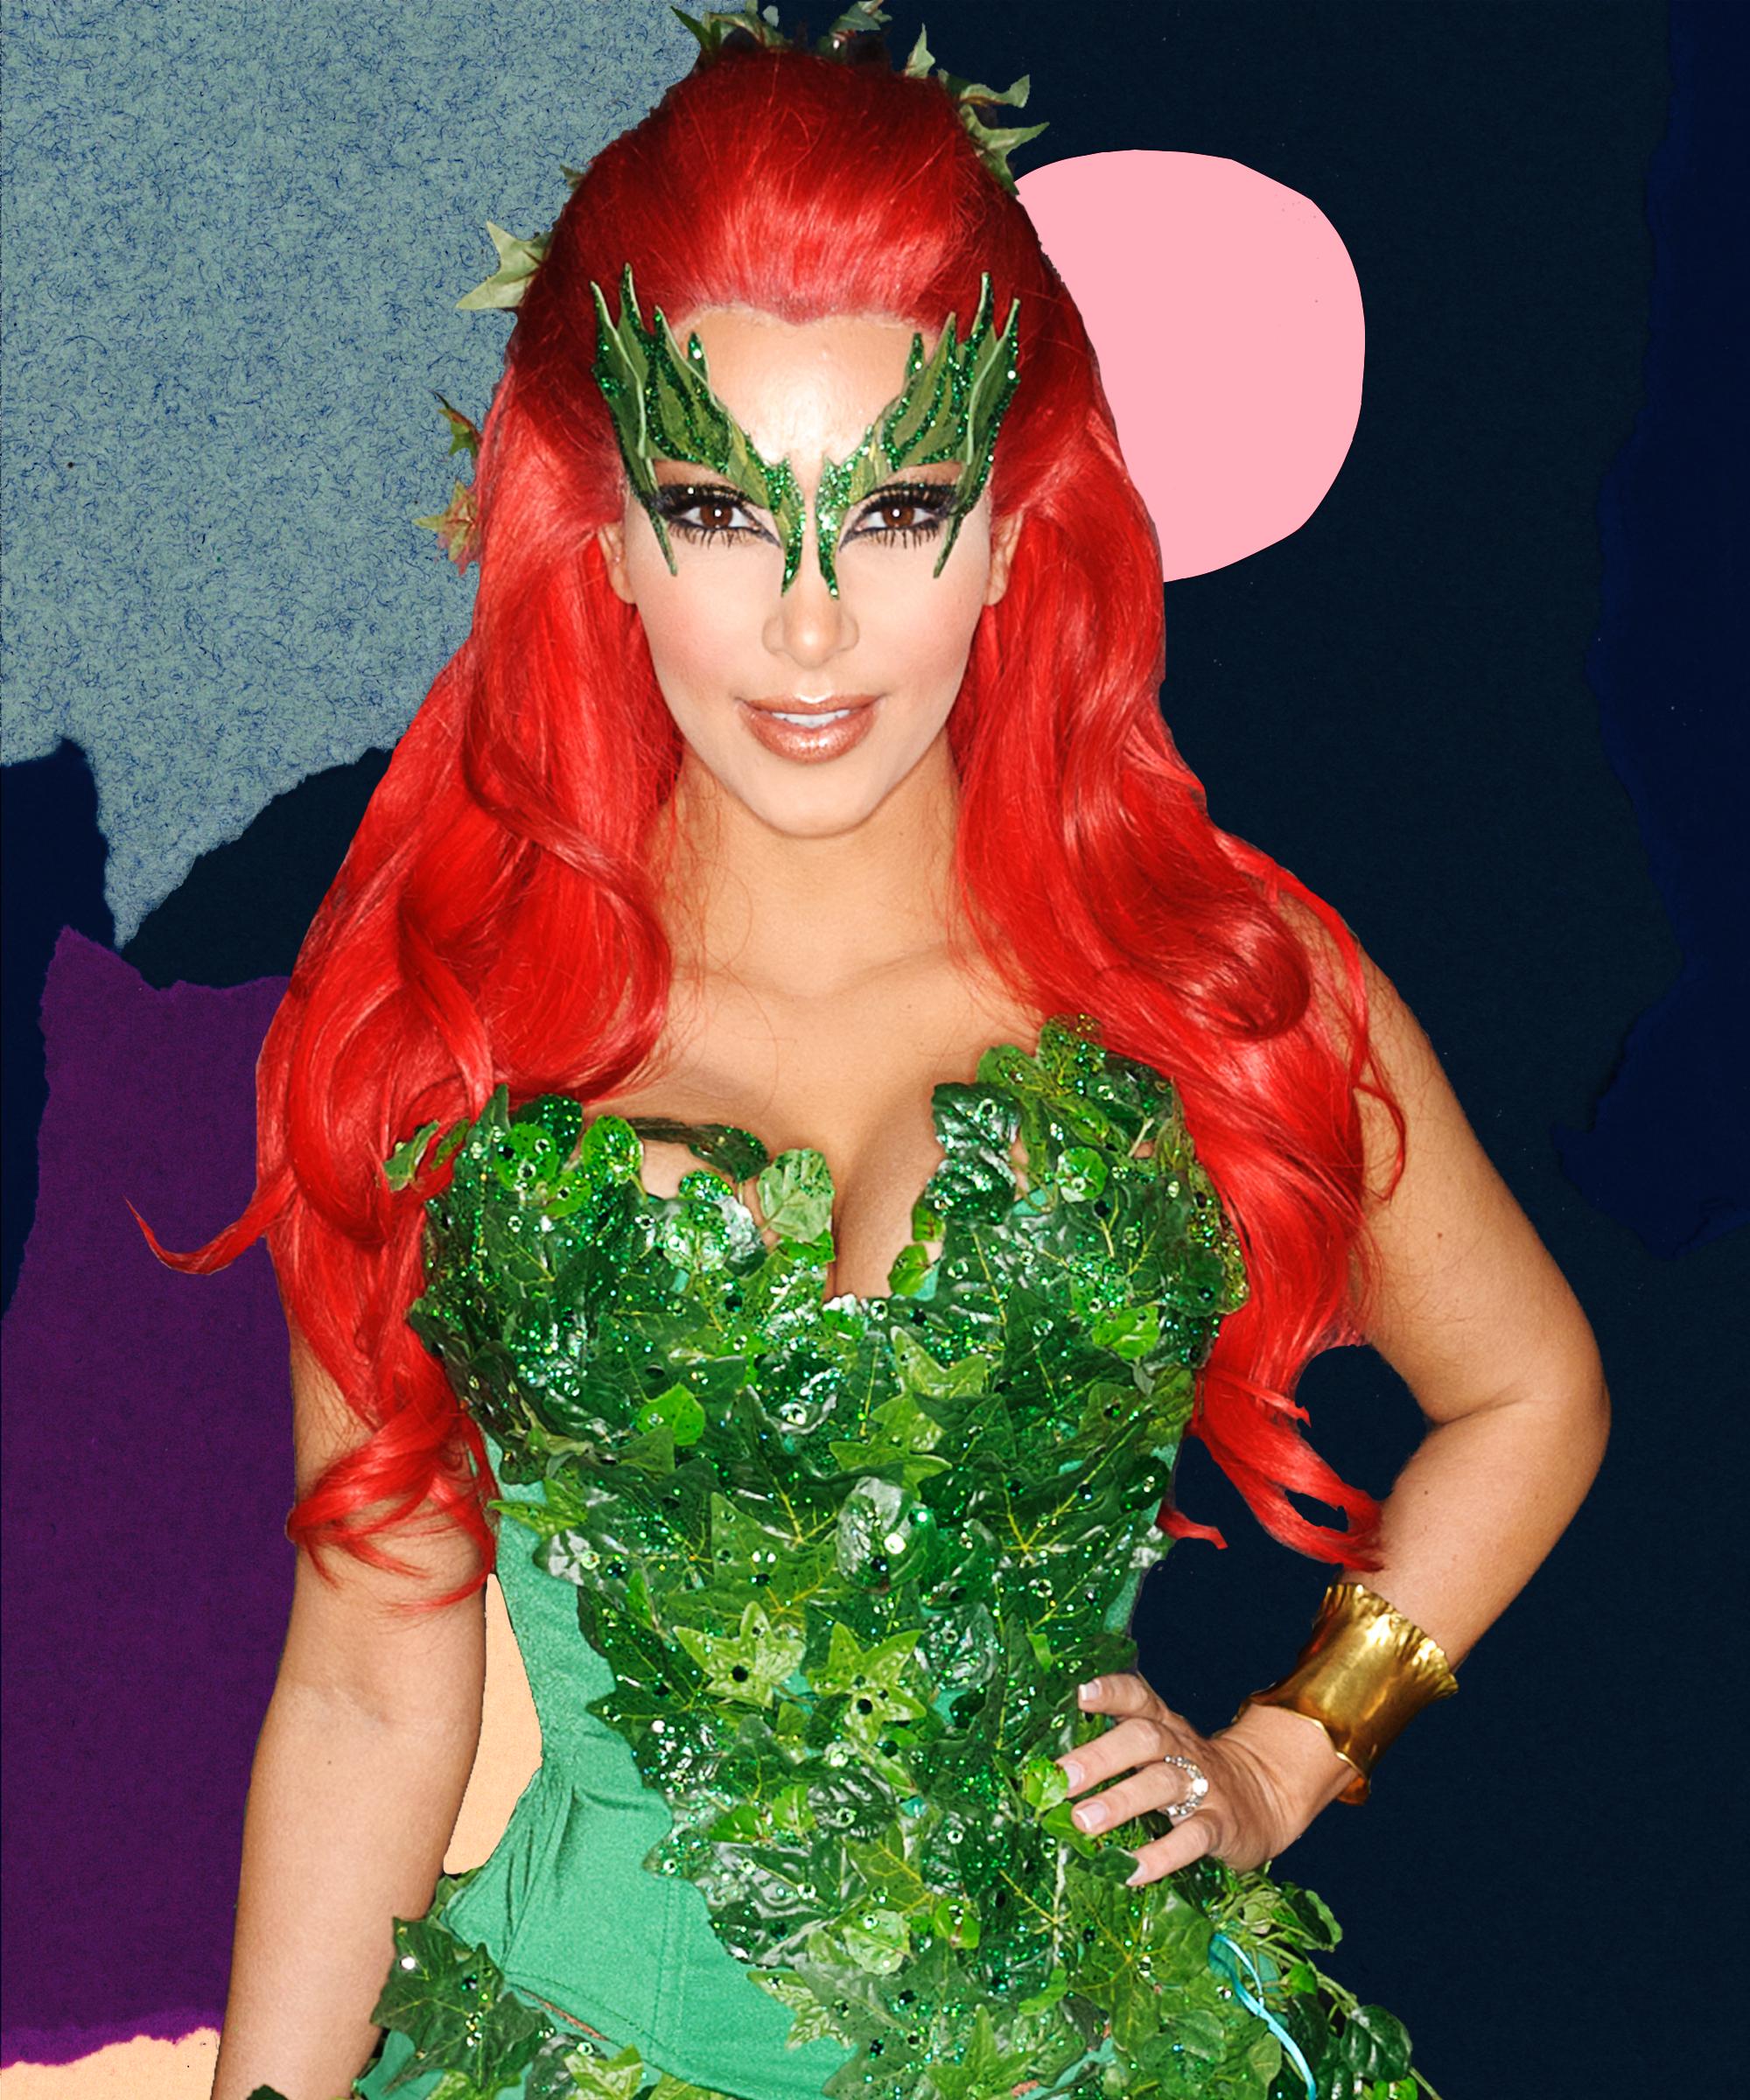 23 Redhead Halloween Costumes 2019 In 2020 Cheap Halloween Wigs Red Head Halloween Costumes Halloween Costume Wigs